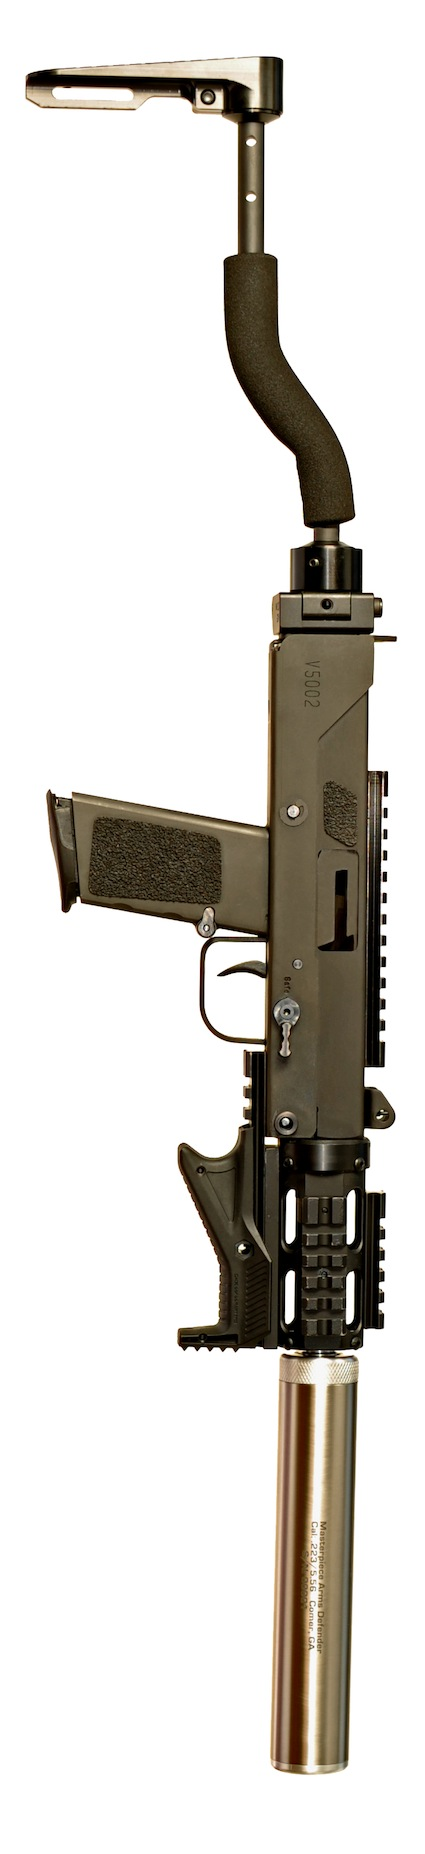 Masterpiece Arms Mpa570sst Sbr